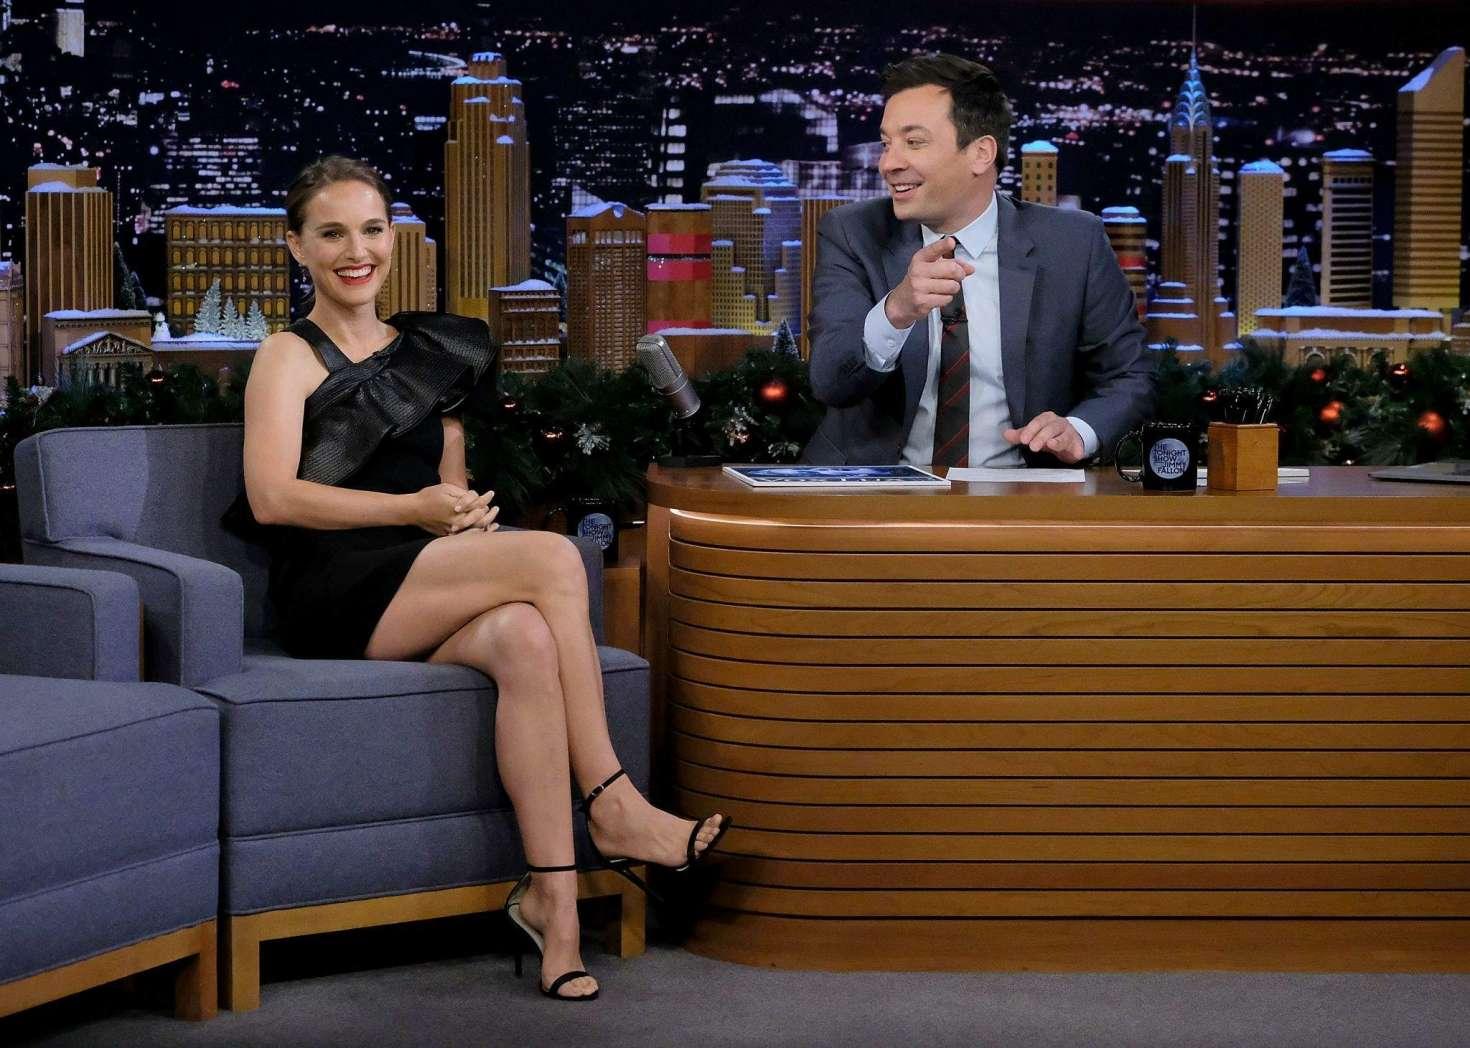 Natalie Portman 2018 : Natalie Portman: The Tonight Show Starring Jimmy Fallon -08